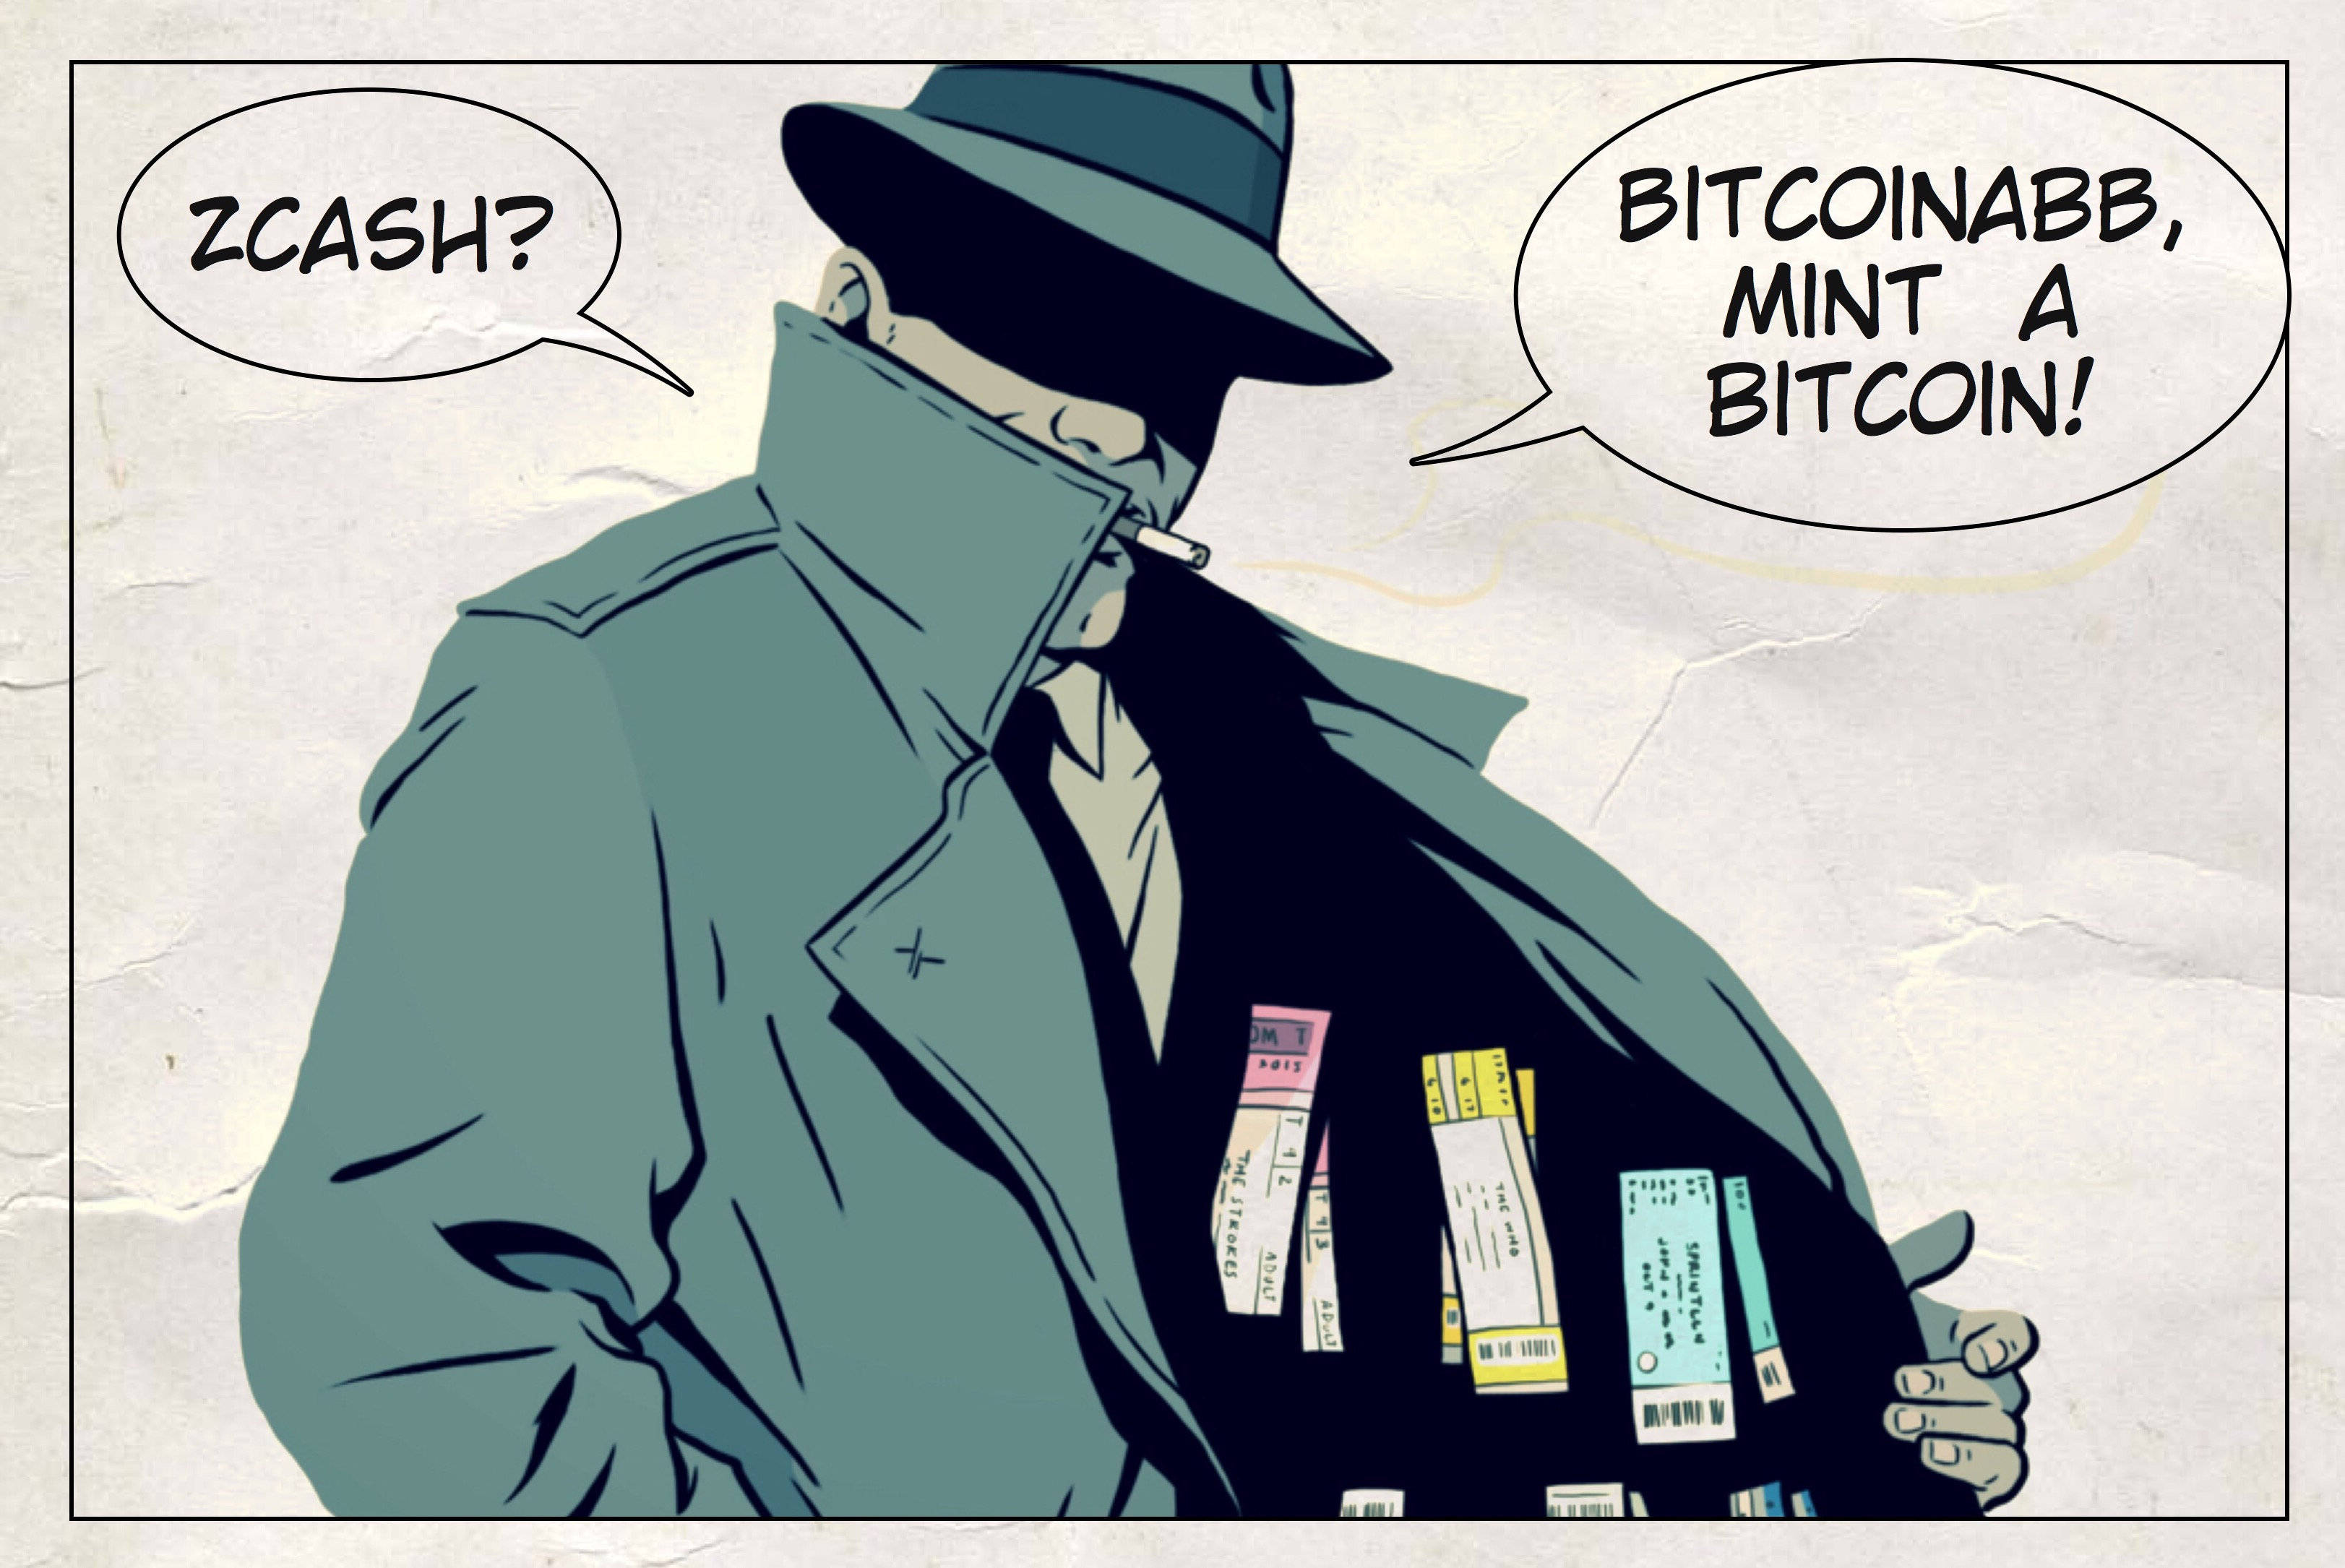 utaljon pénzt bitcoinokra)